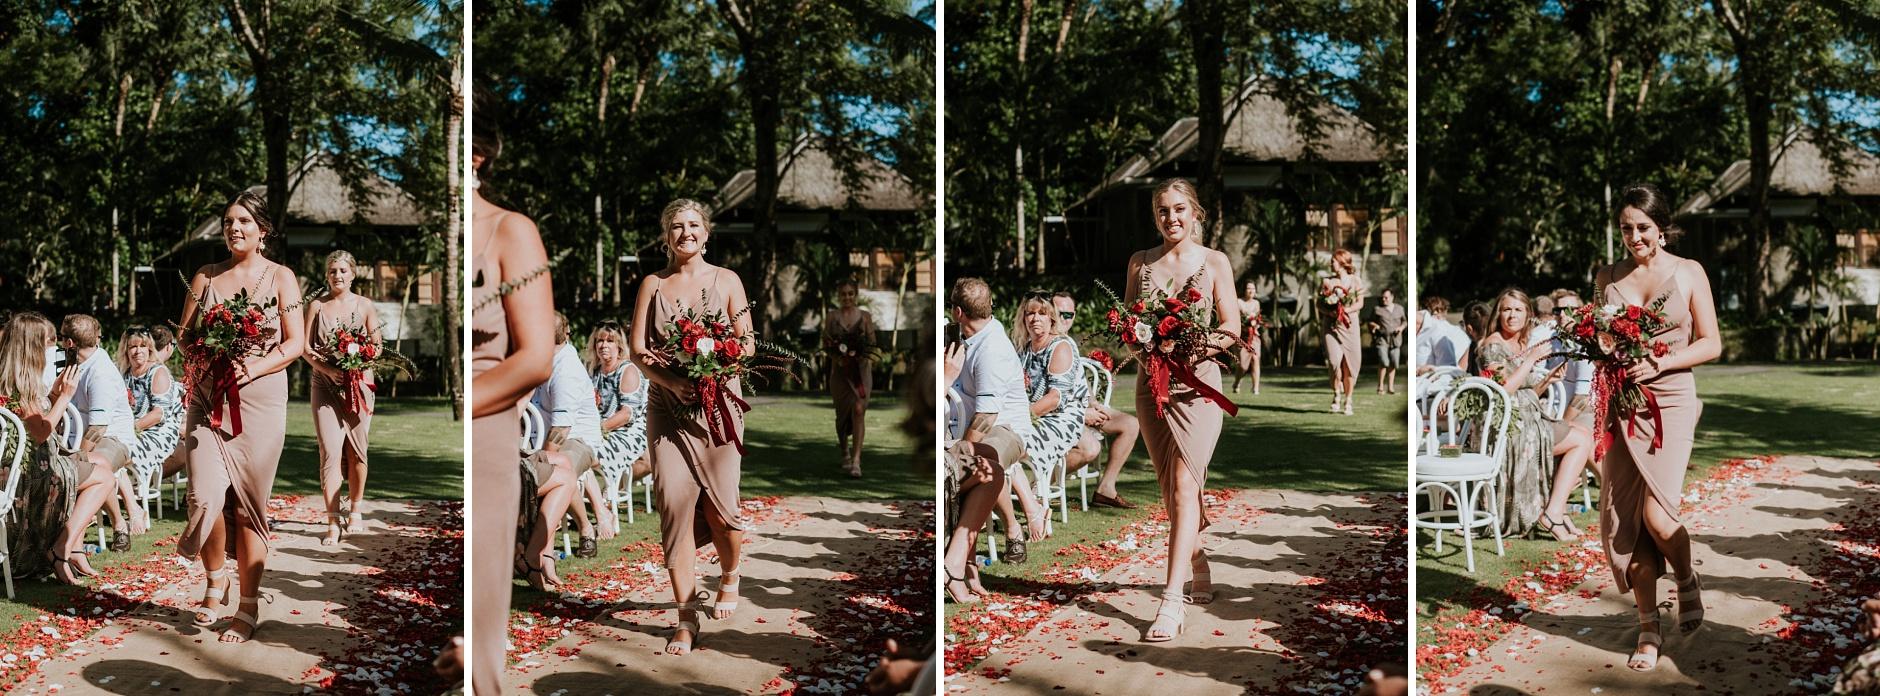 breanna&dan0287a_Bali-Wedding-Photographer.jpg